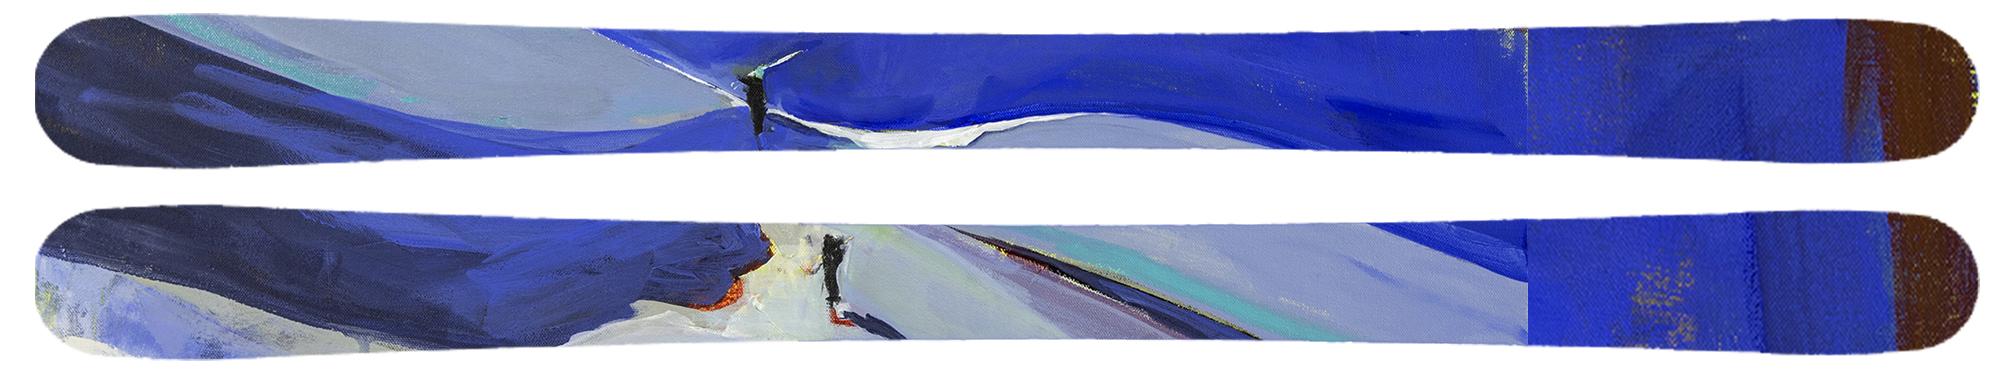 Cornice on skis